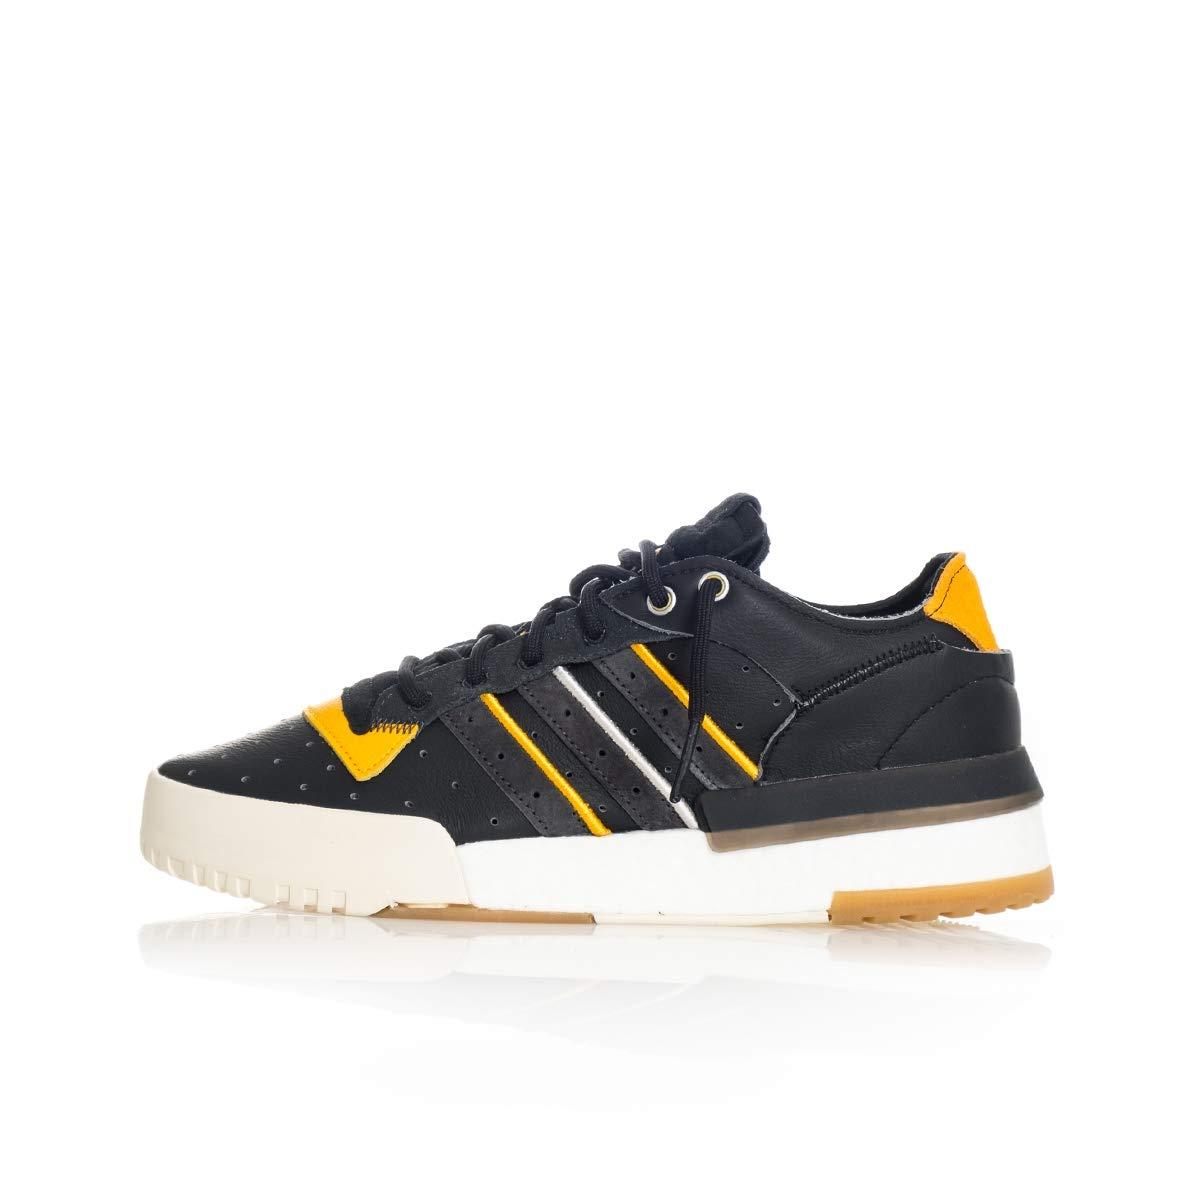 Scarpe DonnaUomo Adidas JEANS Sneakers basse carbon